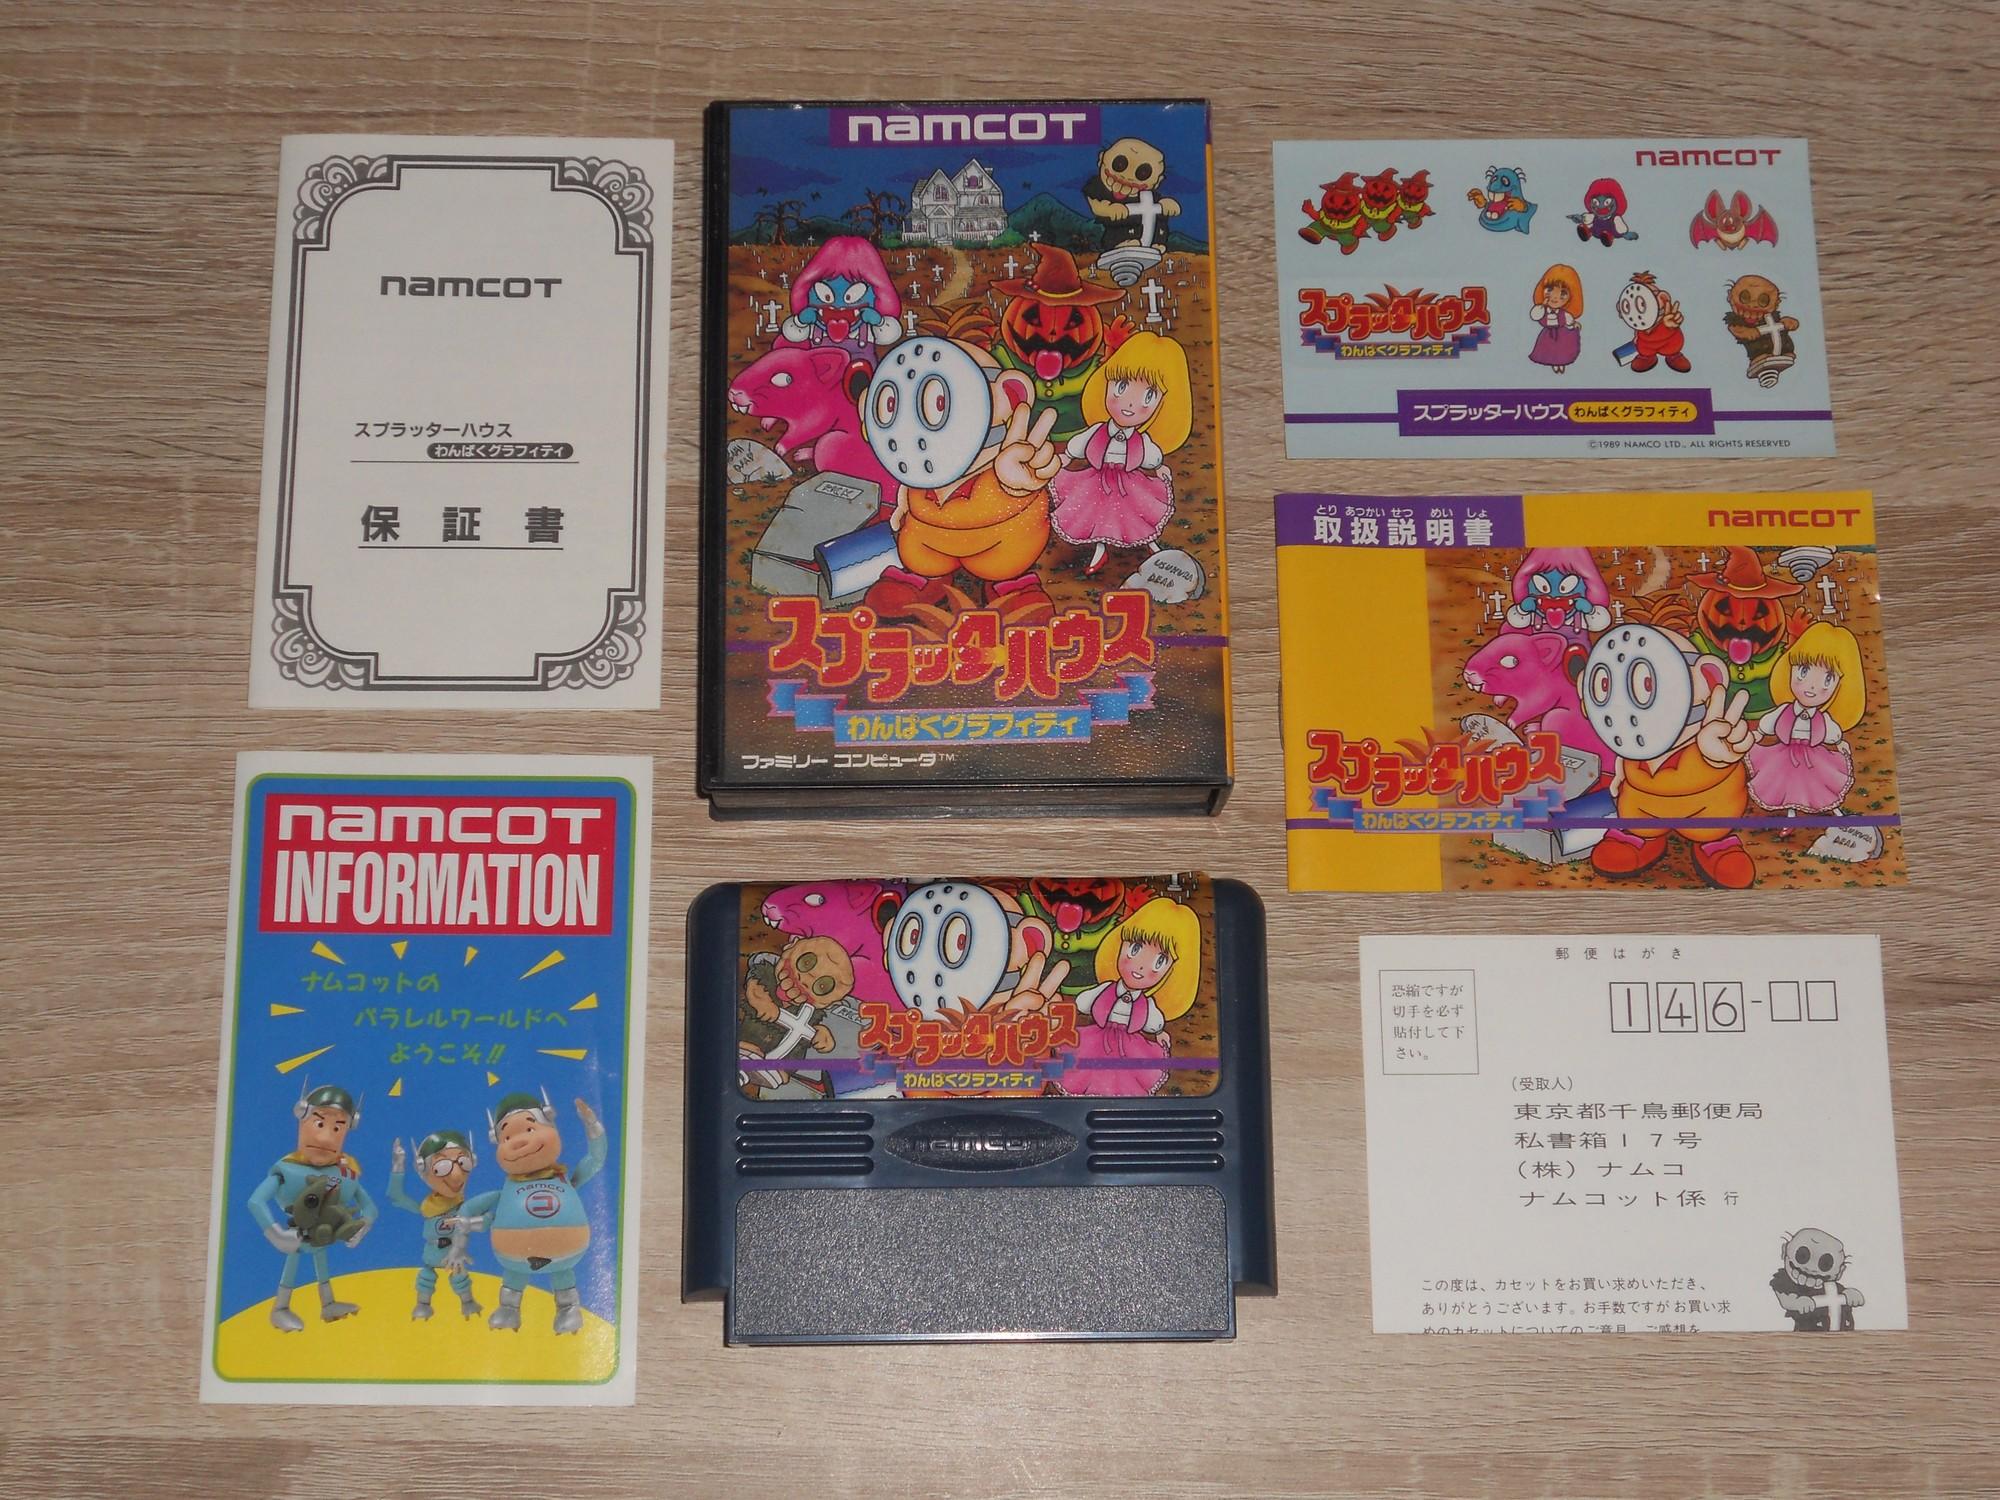 NINTENDO NES + Famicom + Disk System - Page 4 Rnl3eP